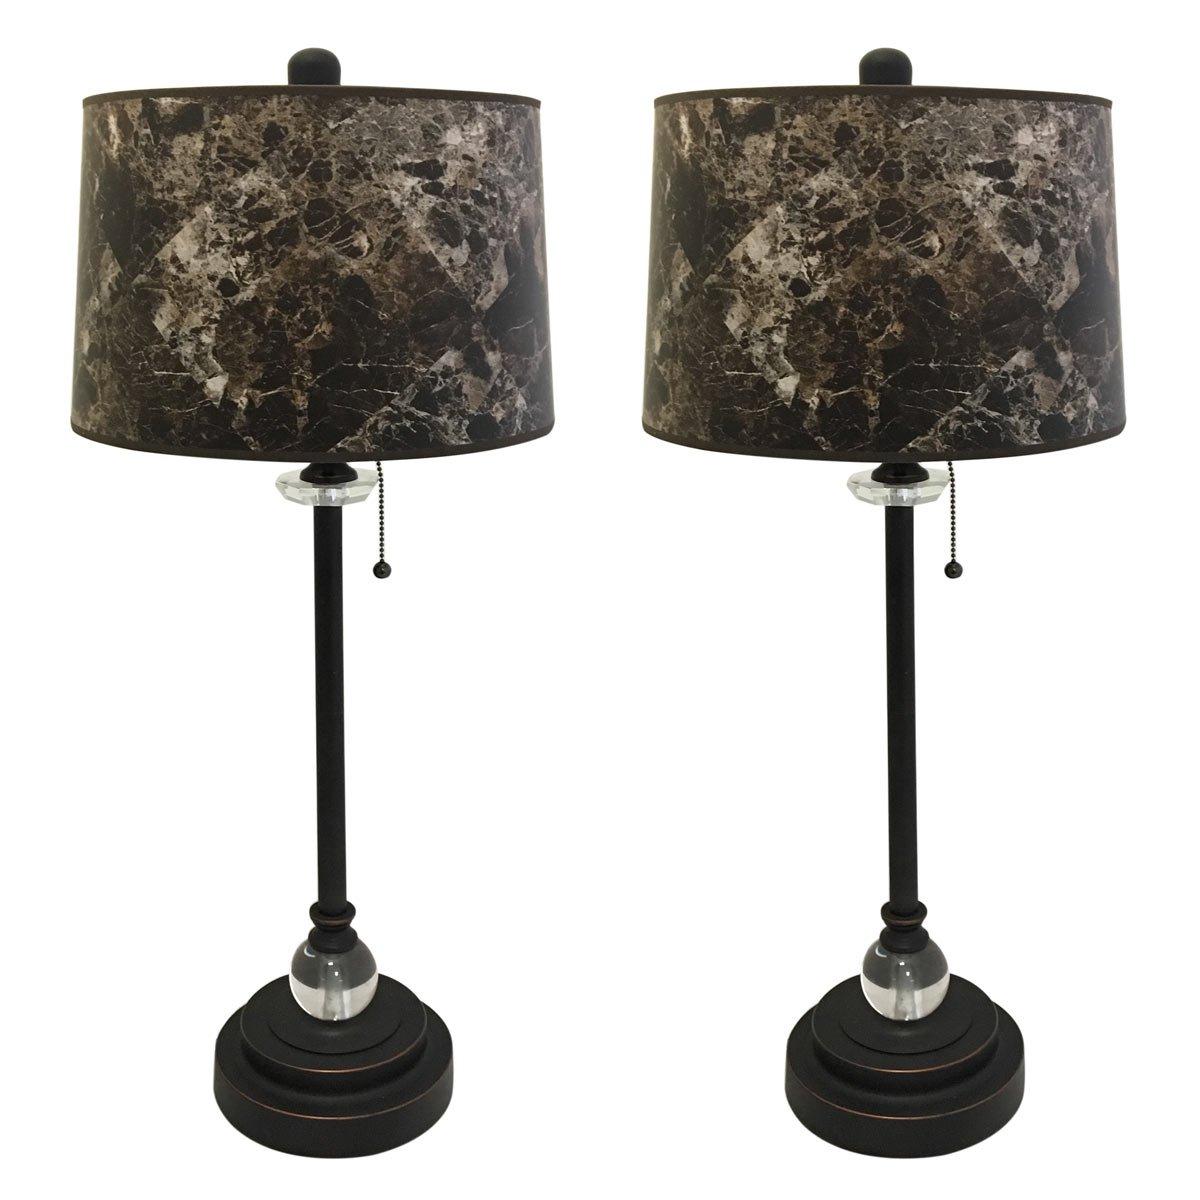 Royal Designs 28'' Crystal and Oil Rub Bronze Buffet Lamp with Dark Brown Marble Hardback Lamp Shade, Set of 2 by Royal Designs, Inc